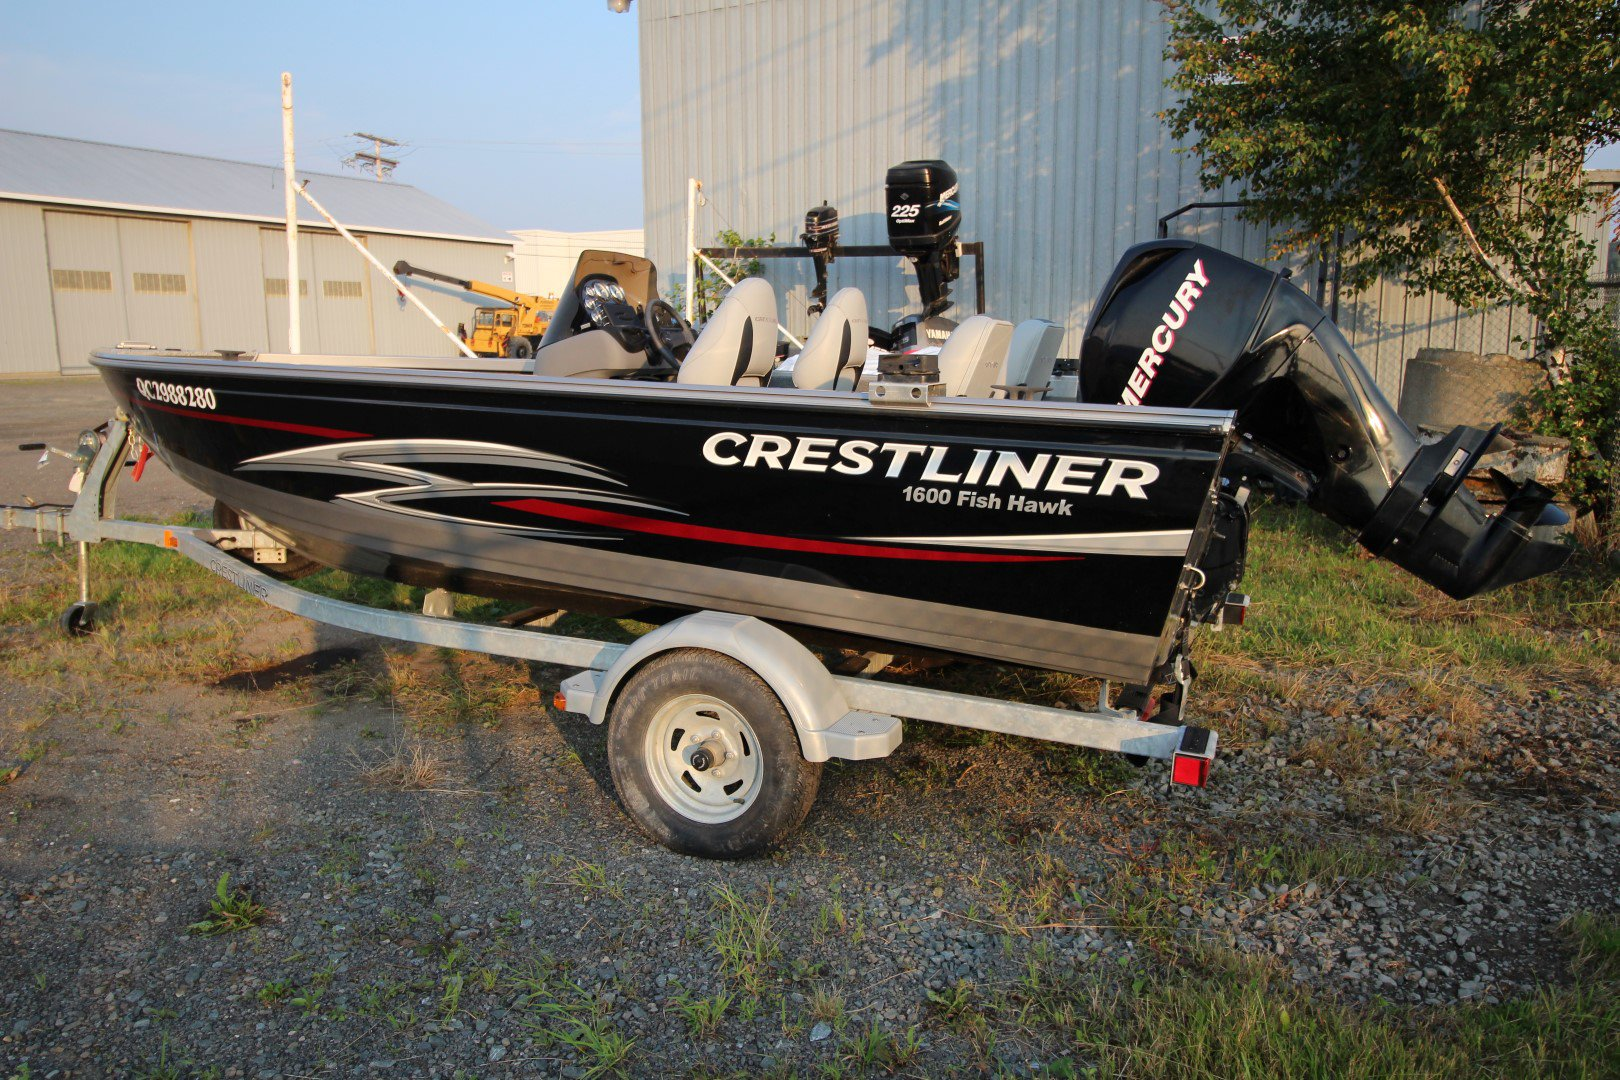 Crestliner FishHawk 1600 - IMG_1594